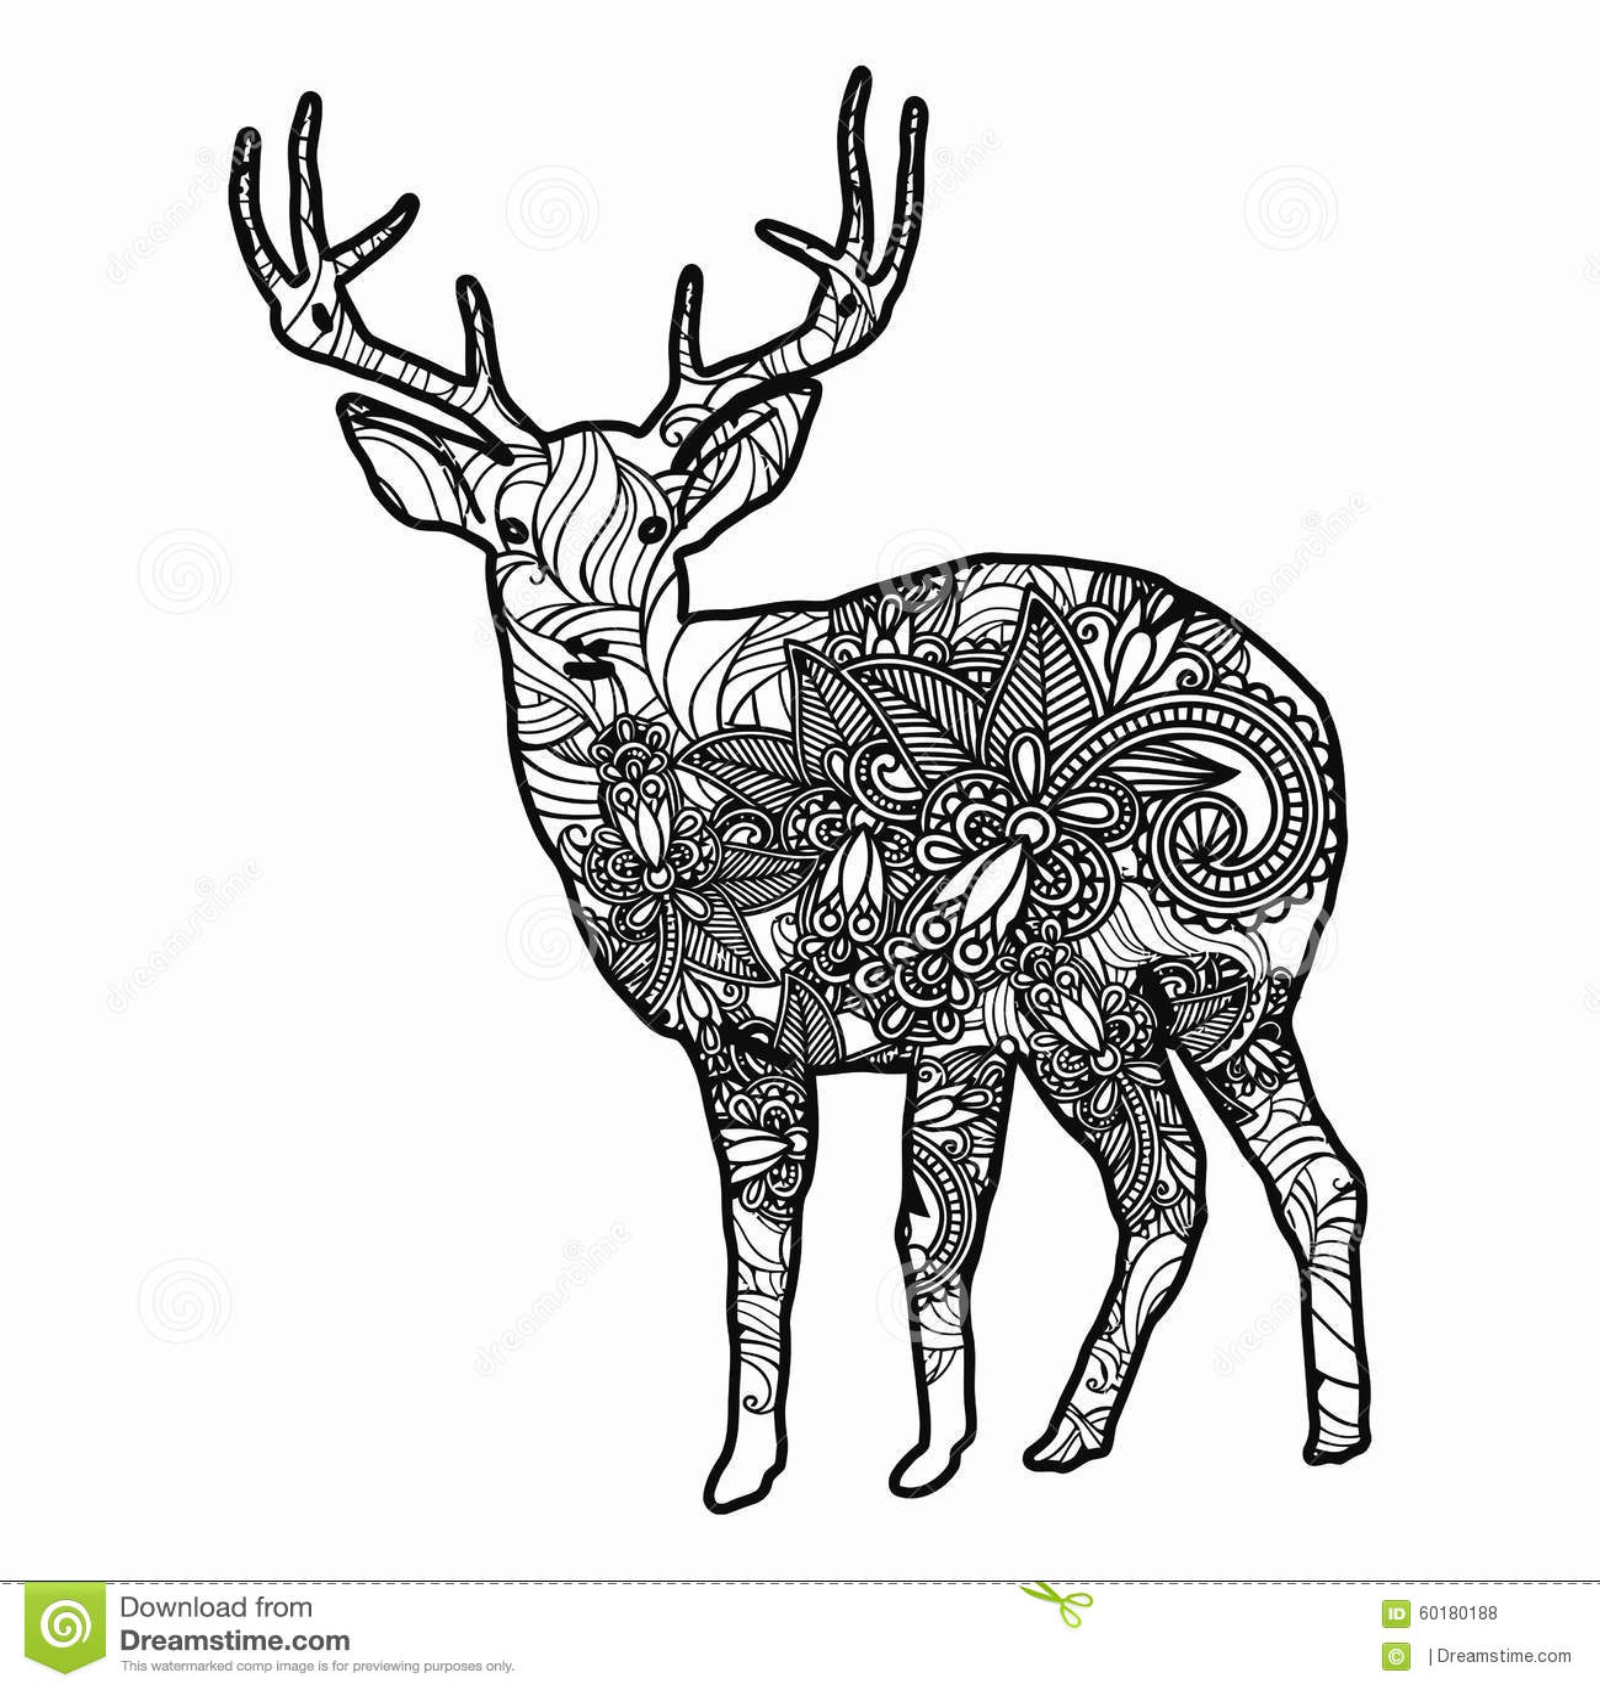 Zentangle Stylized Deer Illustration Hand Drawn Doodle